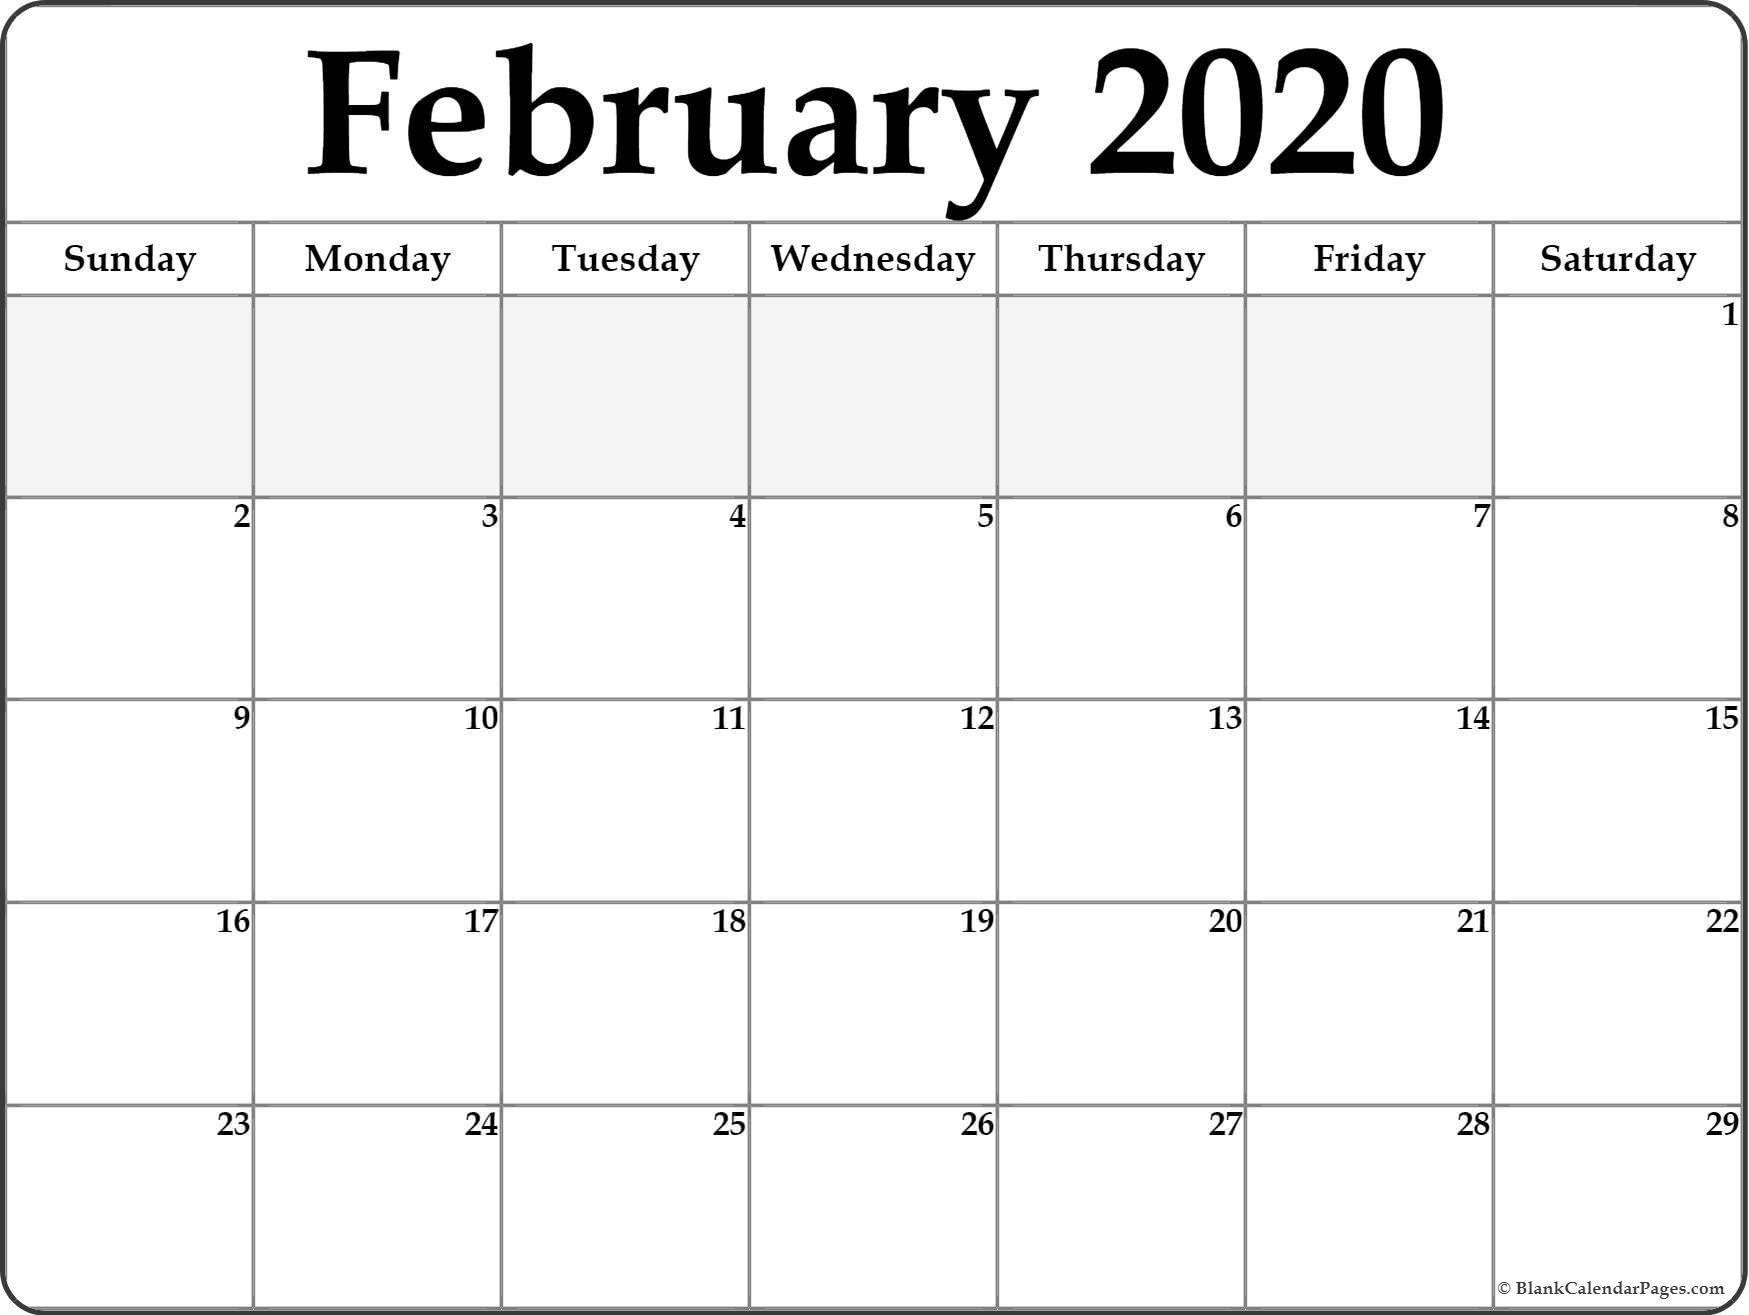 February 2020 Calendar | Free Printable Monthly Calendars for Calendar 2020 Large Box